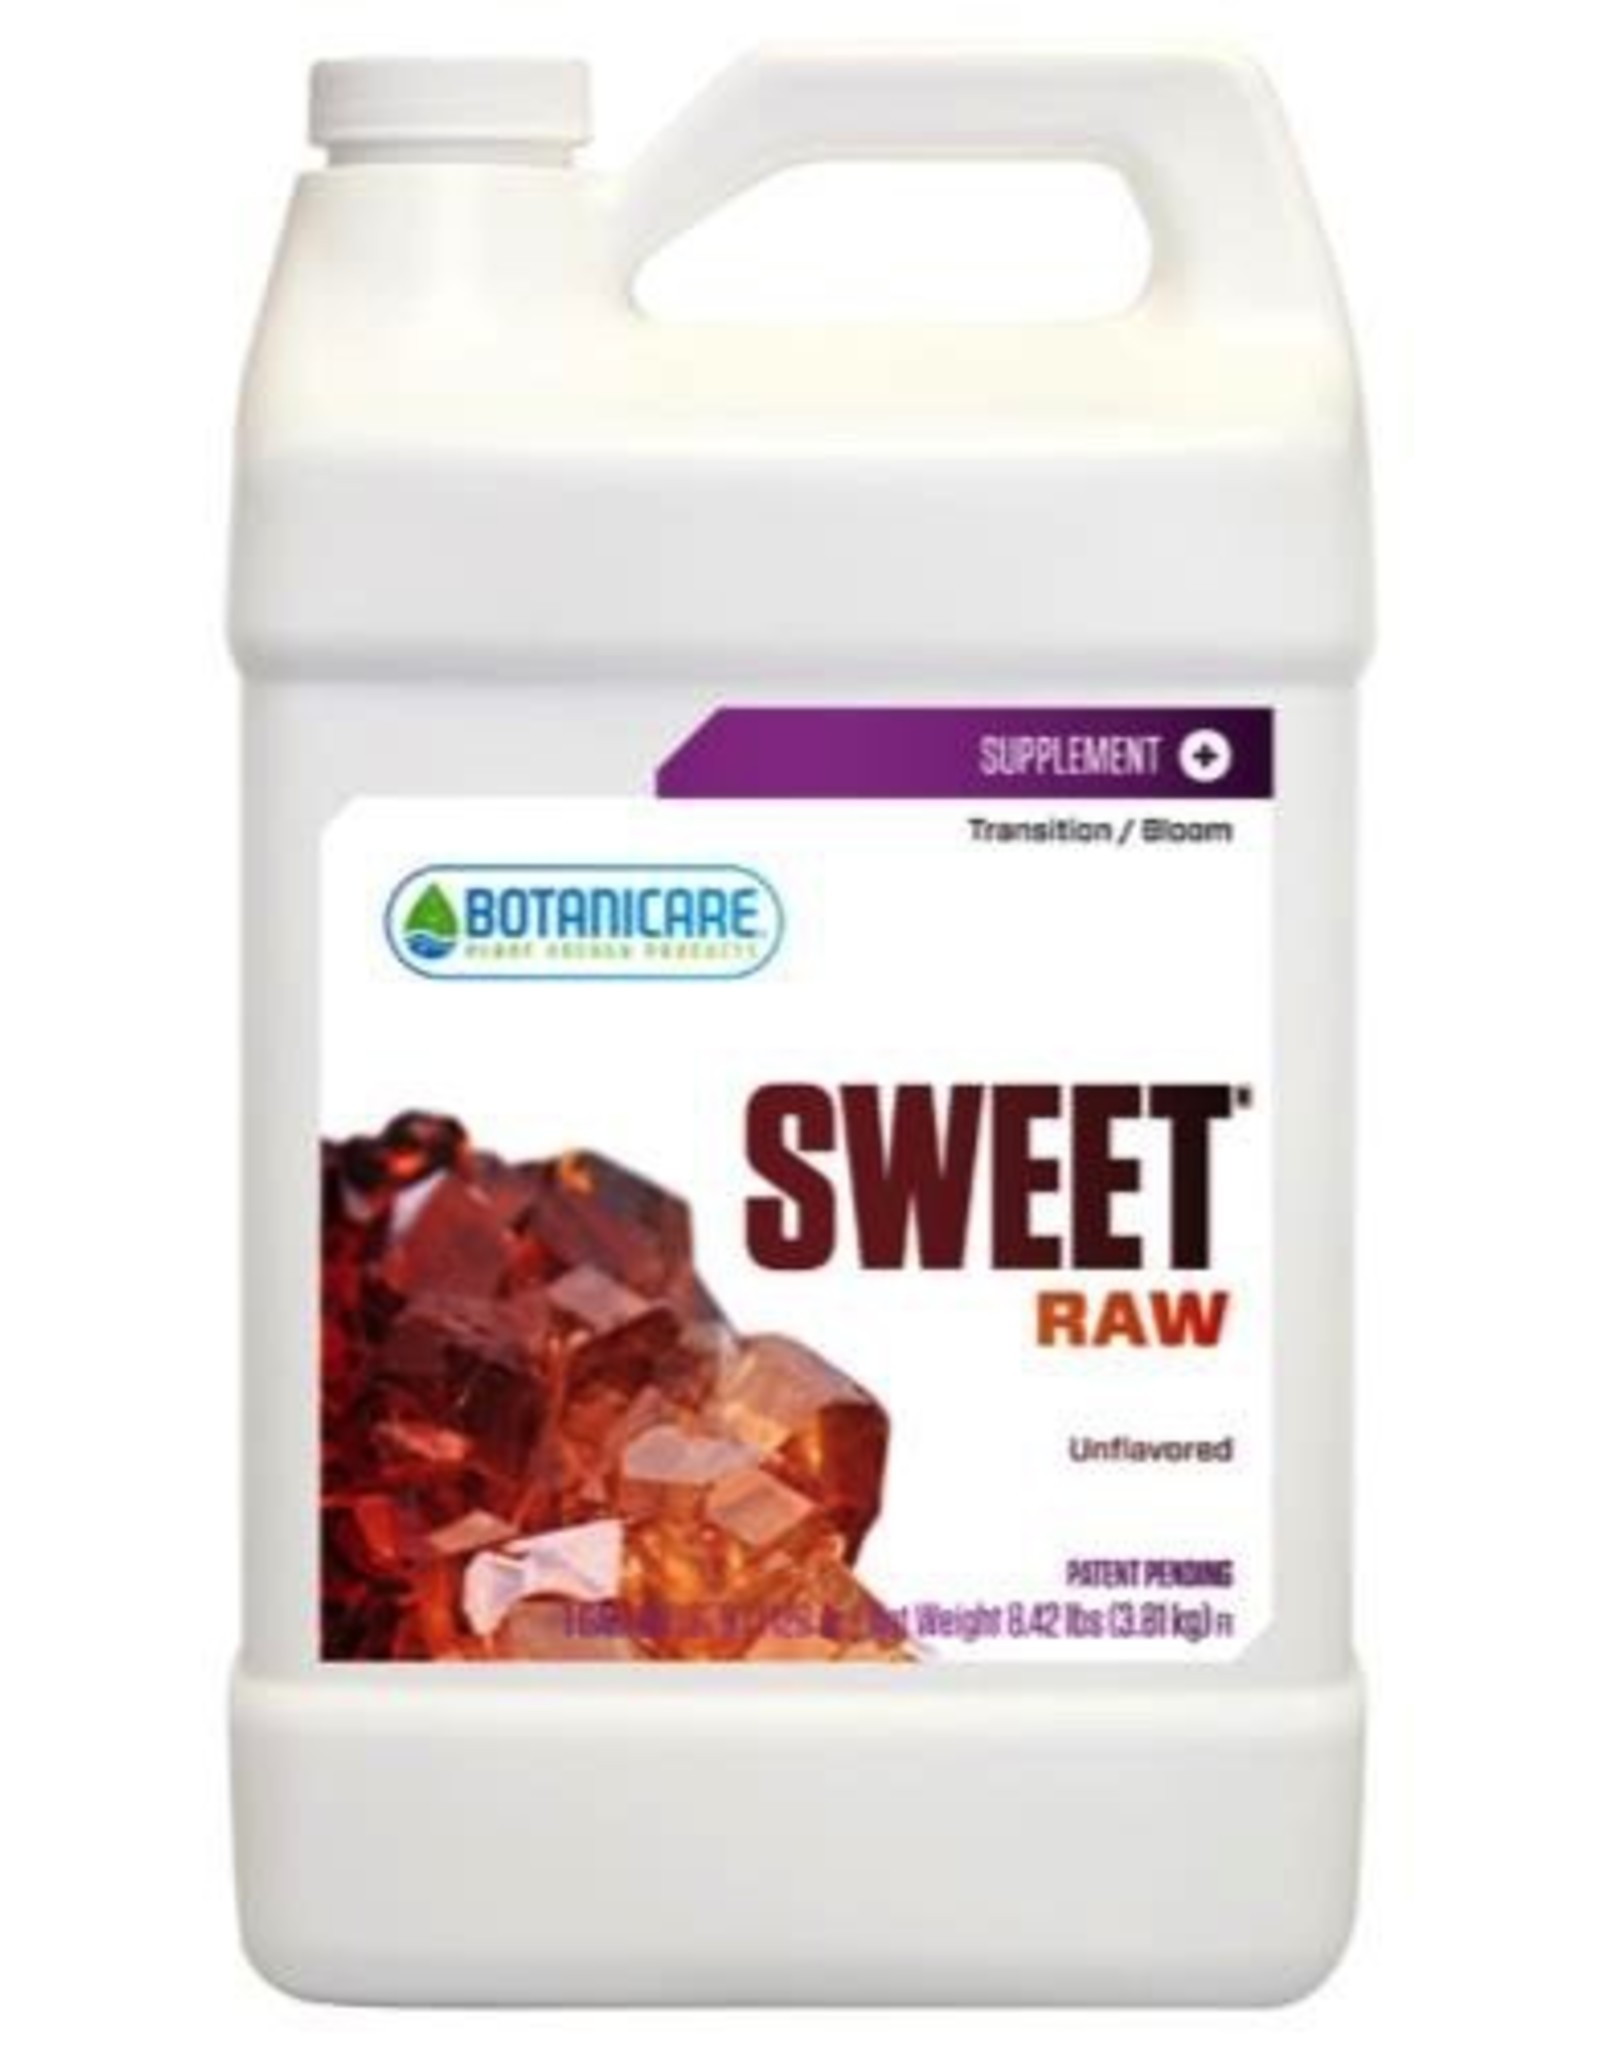 BOTANICARE Botanicare Sweet Carbo Raw Gallon